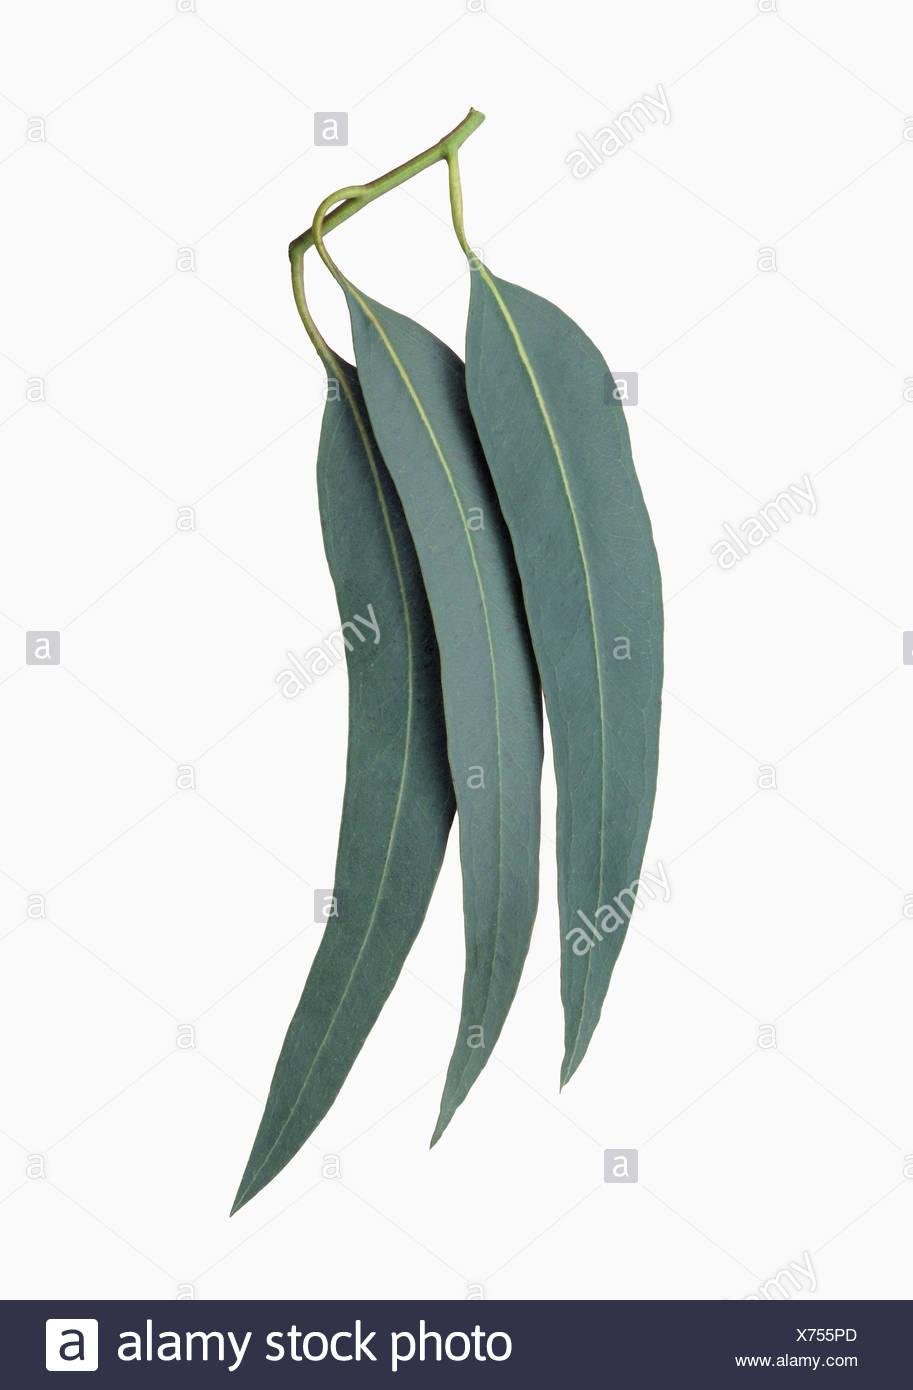 Eucalyptus, Eucalyptus globulus. - Stock Image